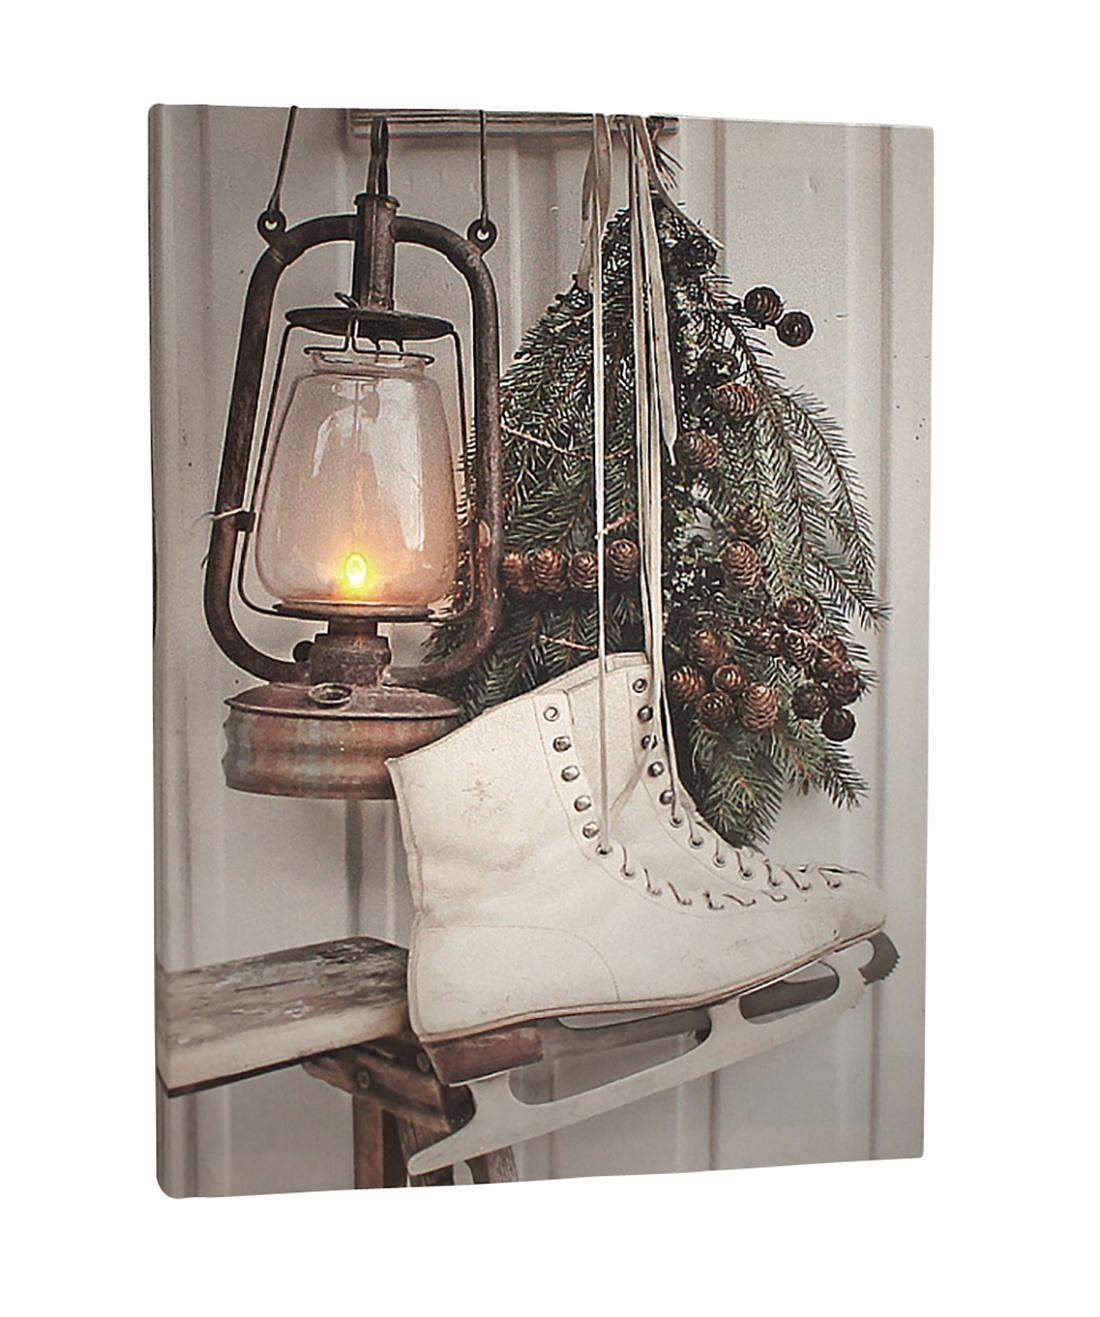 leinwandbild mit led beleuchtung 30 x 40 cm wandbild vintage mit schlittschuh leuchtbild led. Black Bedroom Furniture Sets. Home Design Ideas